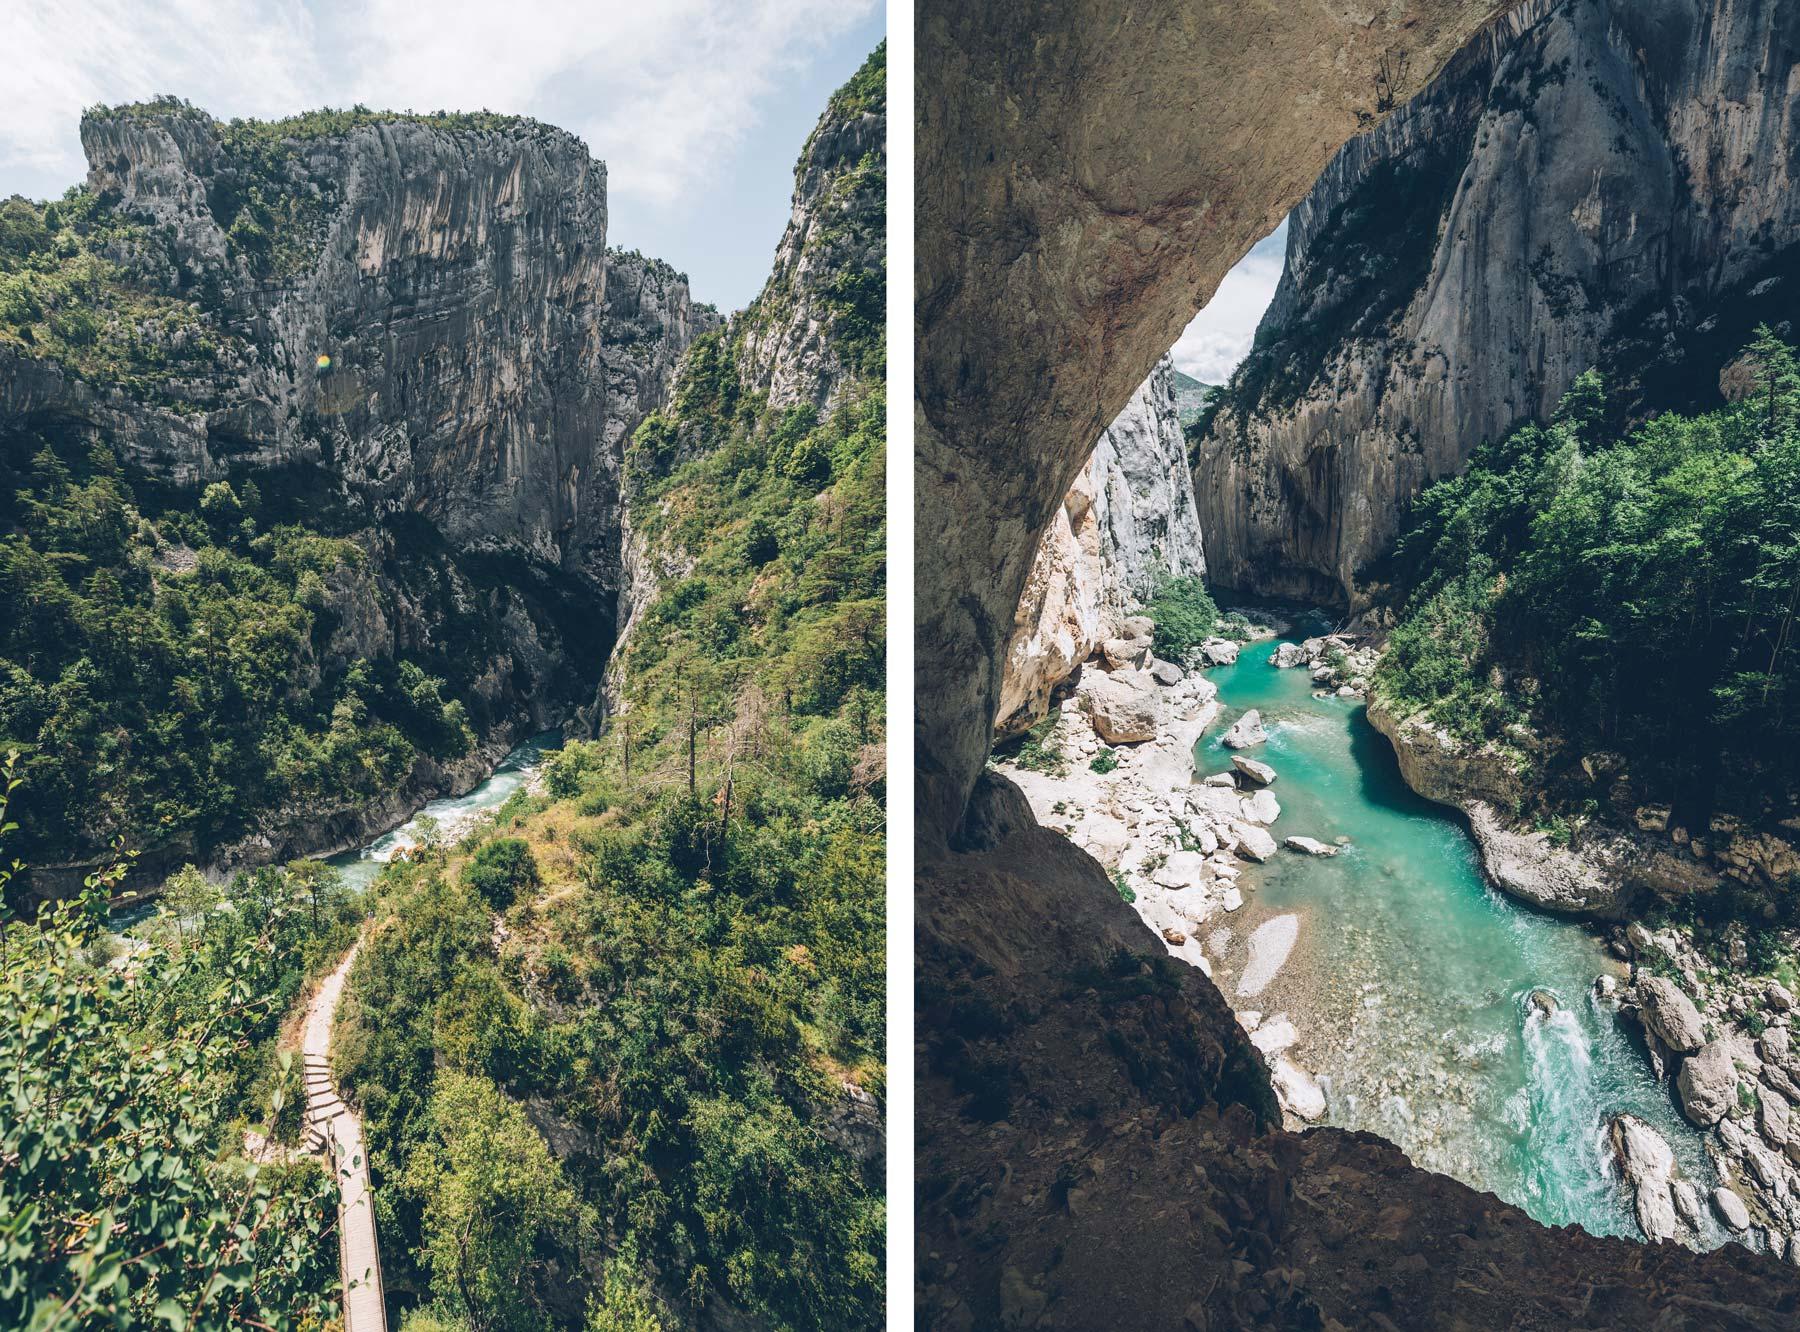 Sentier Blanc Martel, Gorges du Verdon